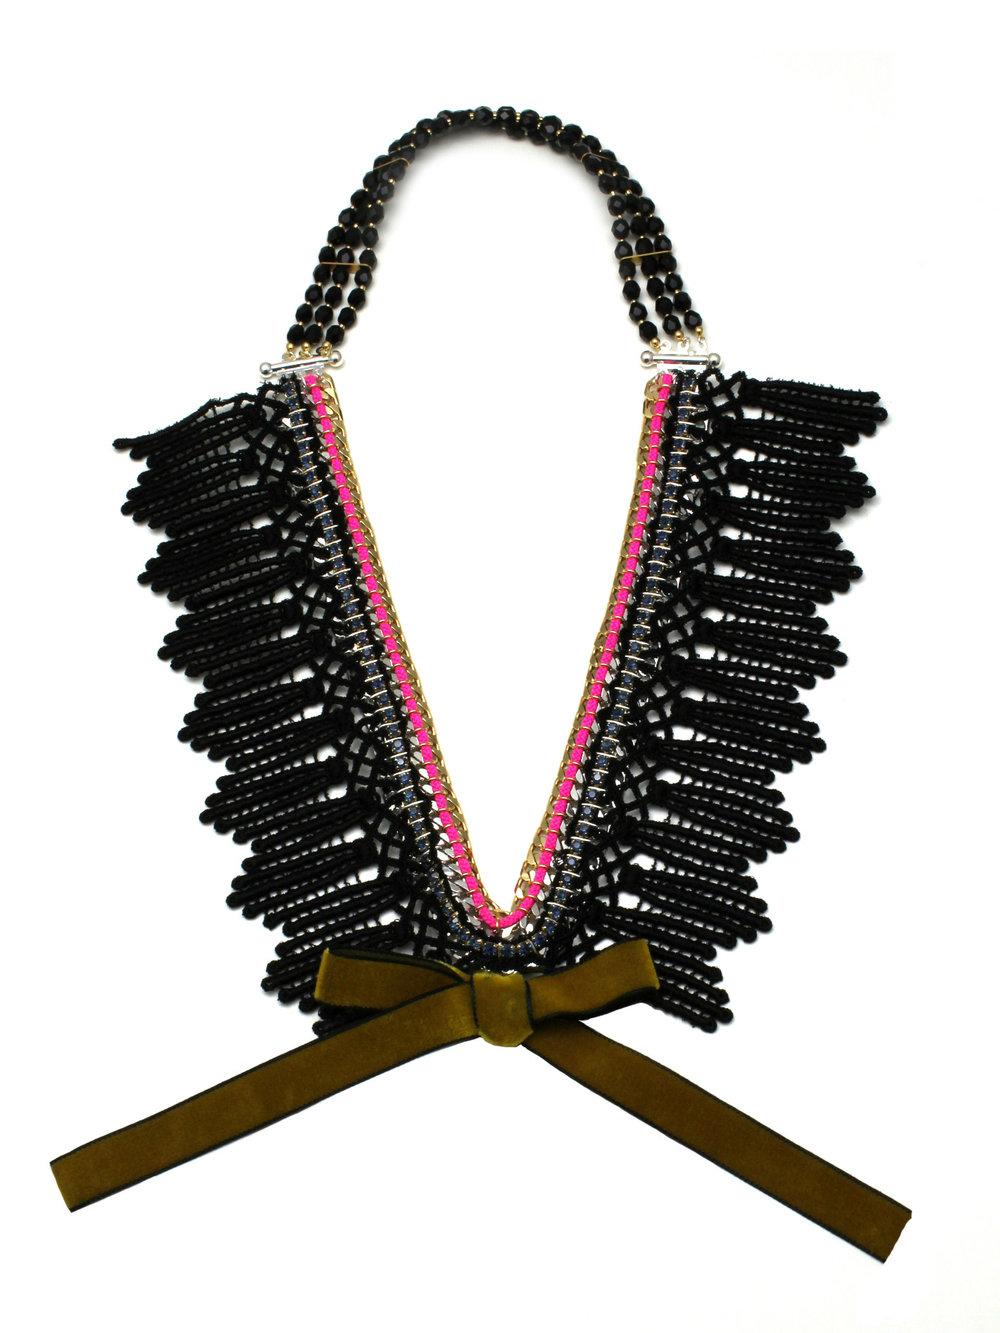 051 - Black Lace Ribbon Necklace.jpg